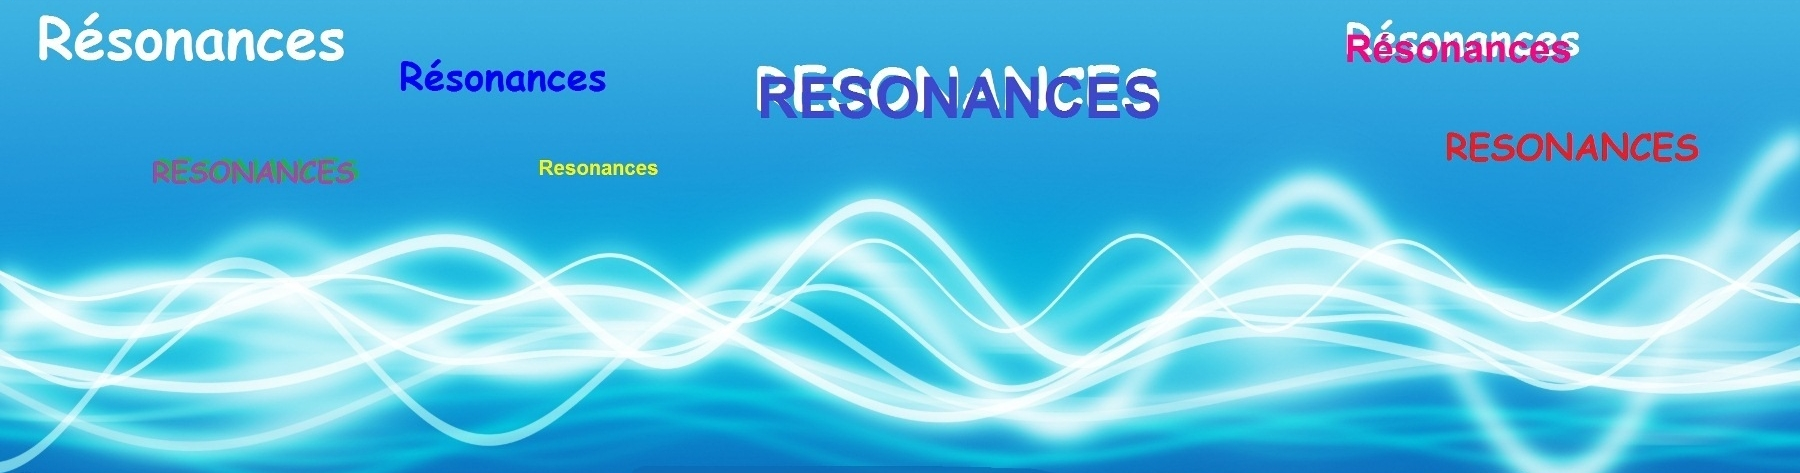 http://radiograffiti.fr/wp-content/uploads/2019/02/resonances.jpg